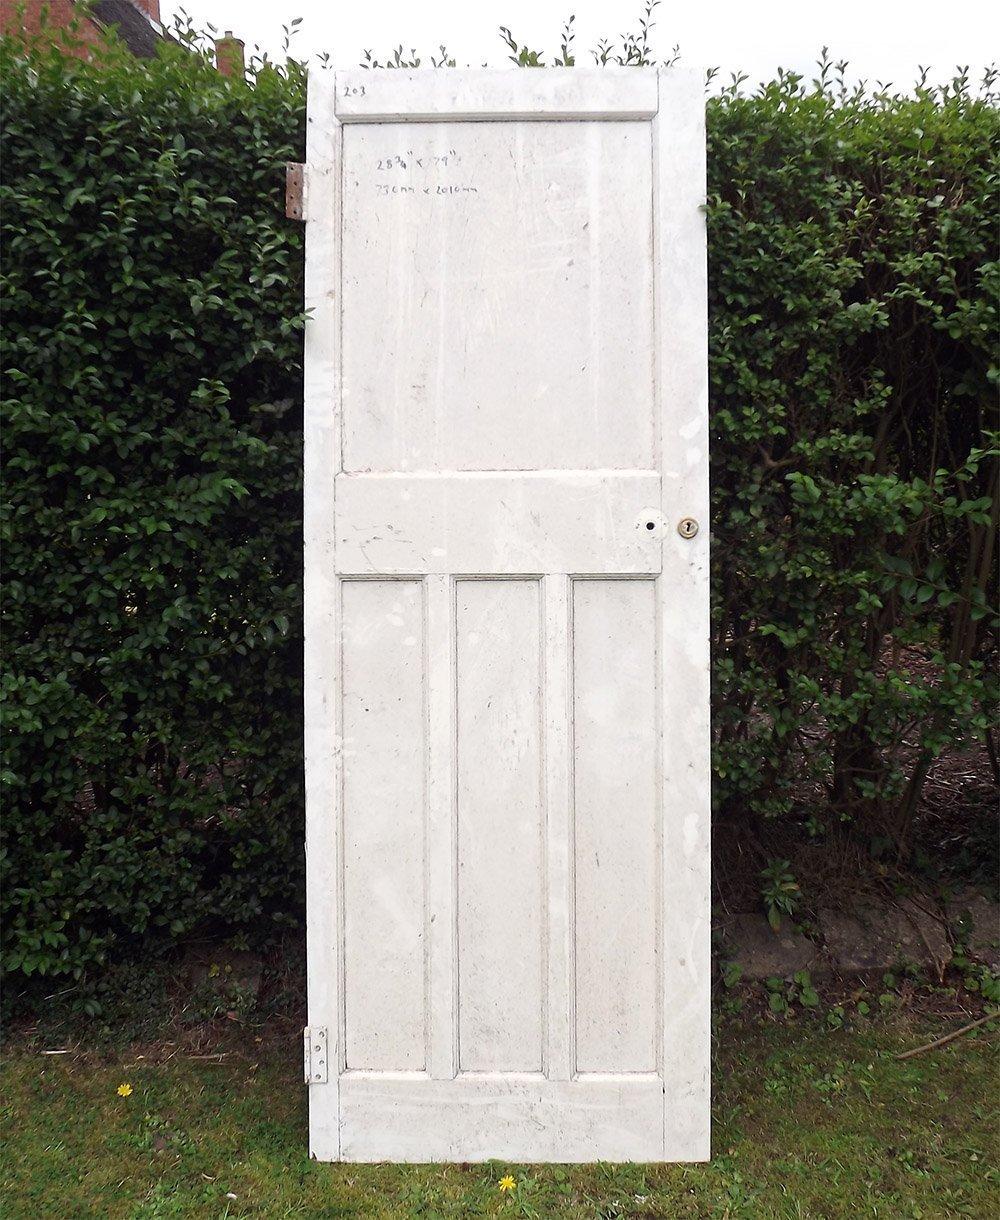 Tudor Reclamation and antiques Shrewsbury - 1930's door